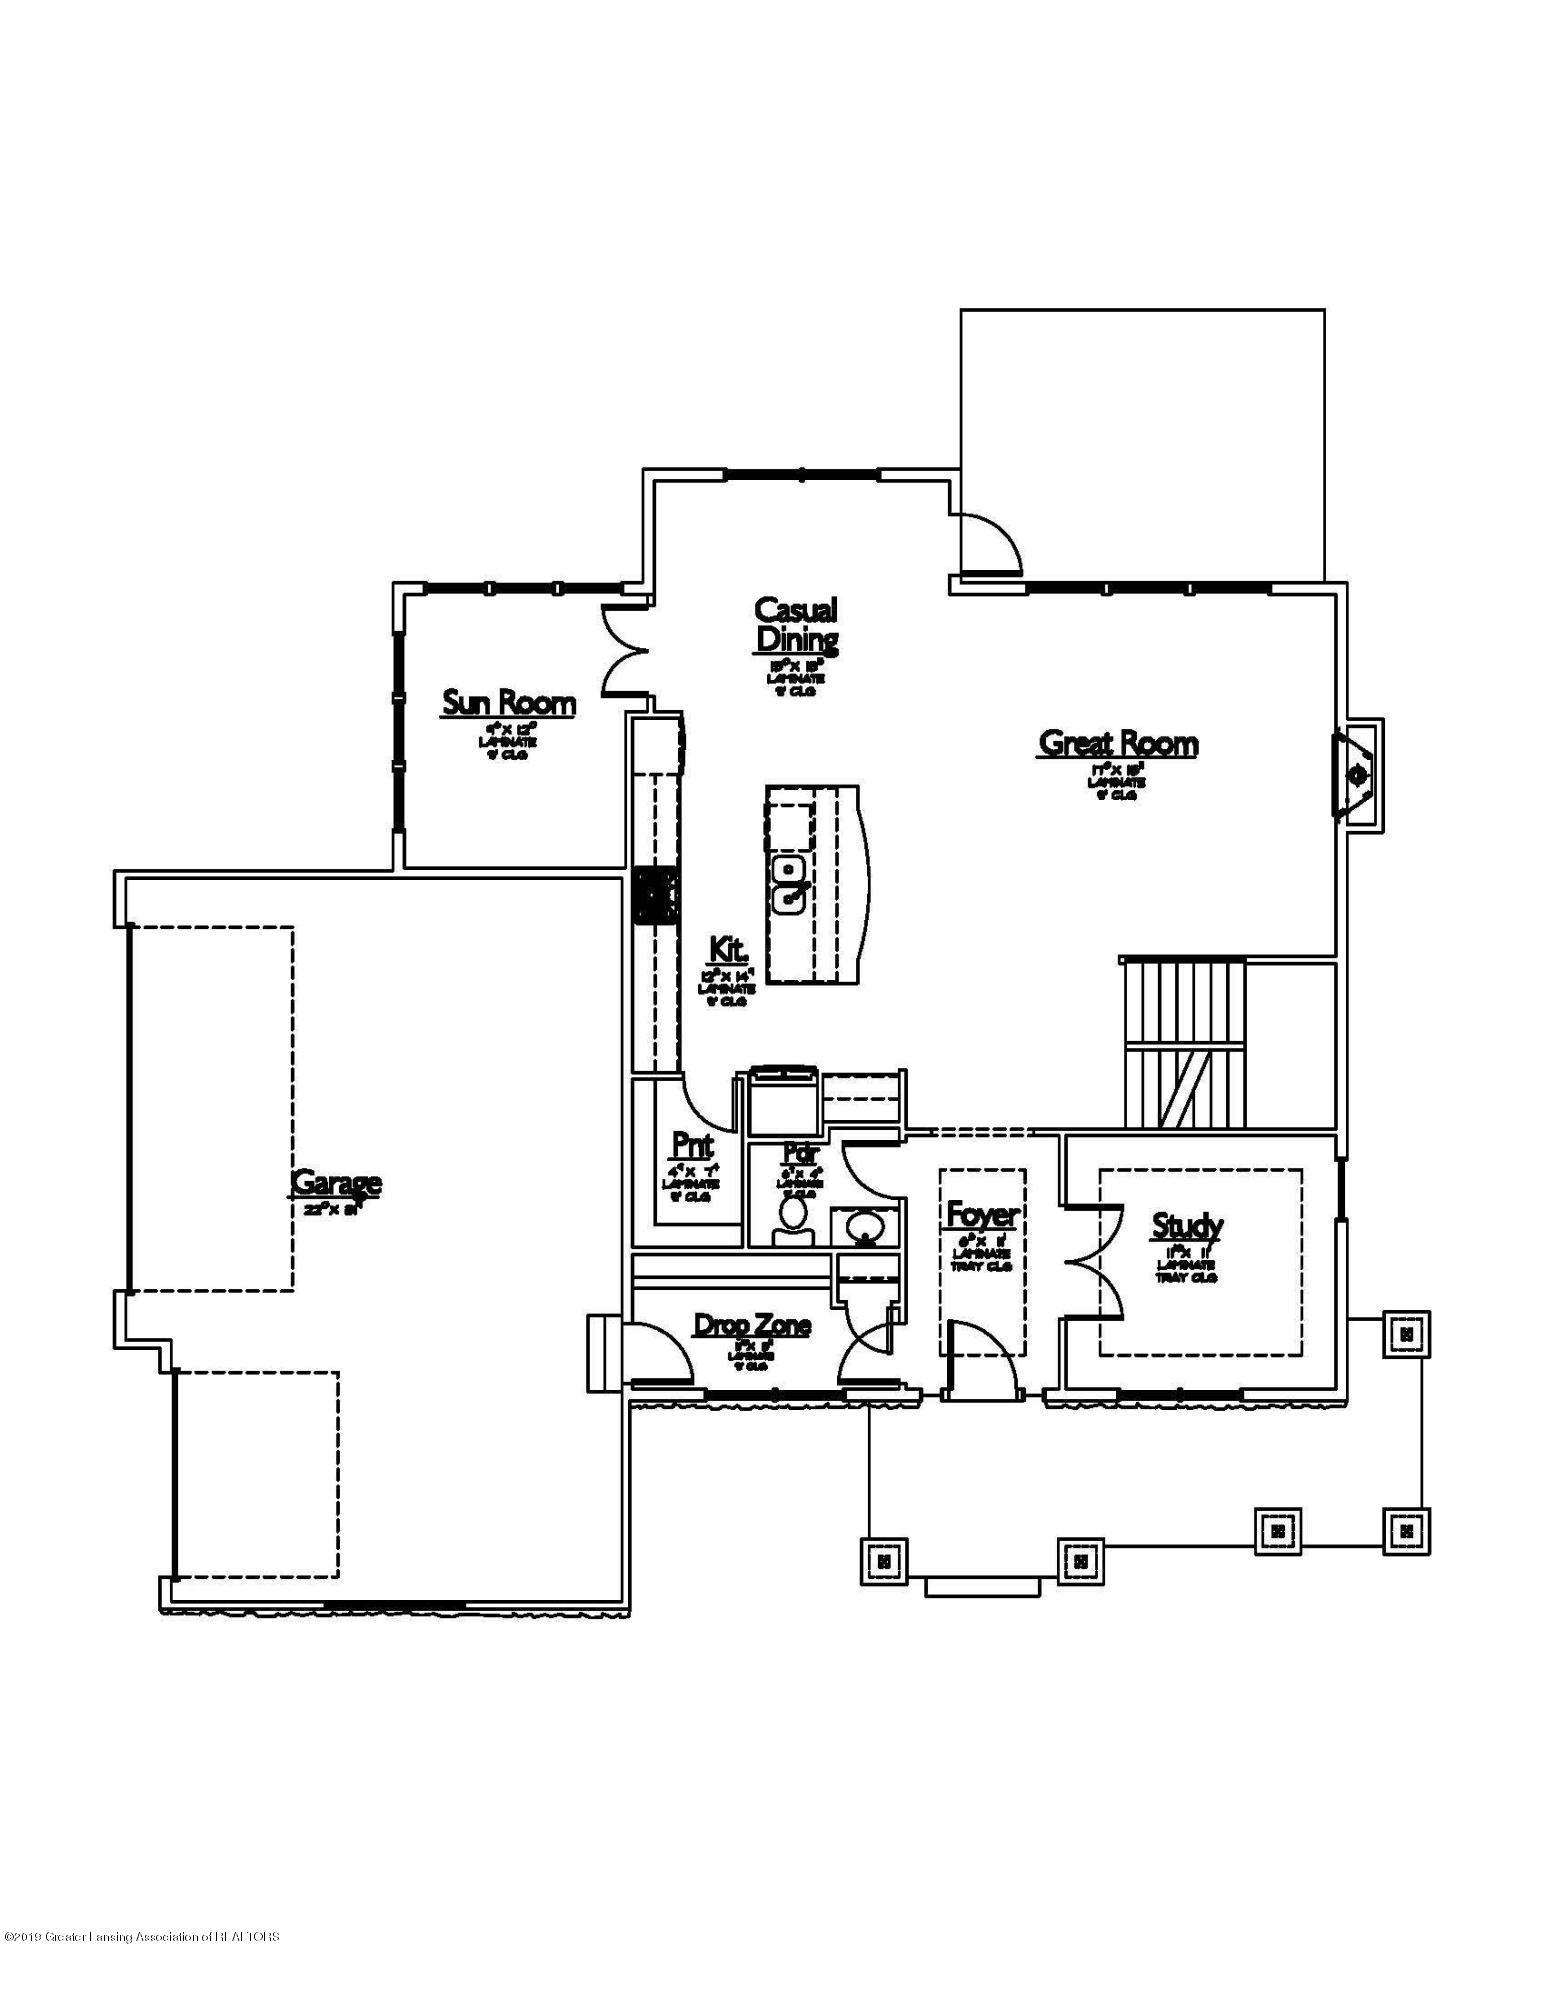 6096 Sleepy Hollow Ln - SR56-first floor - 3